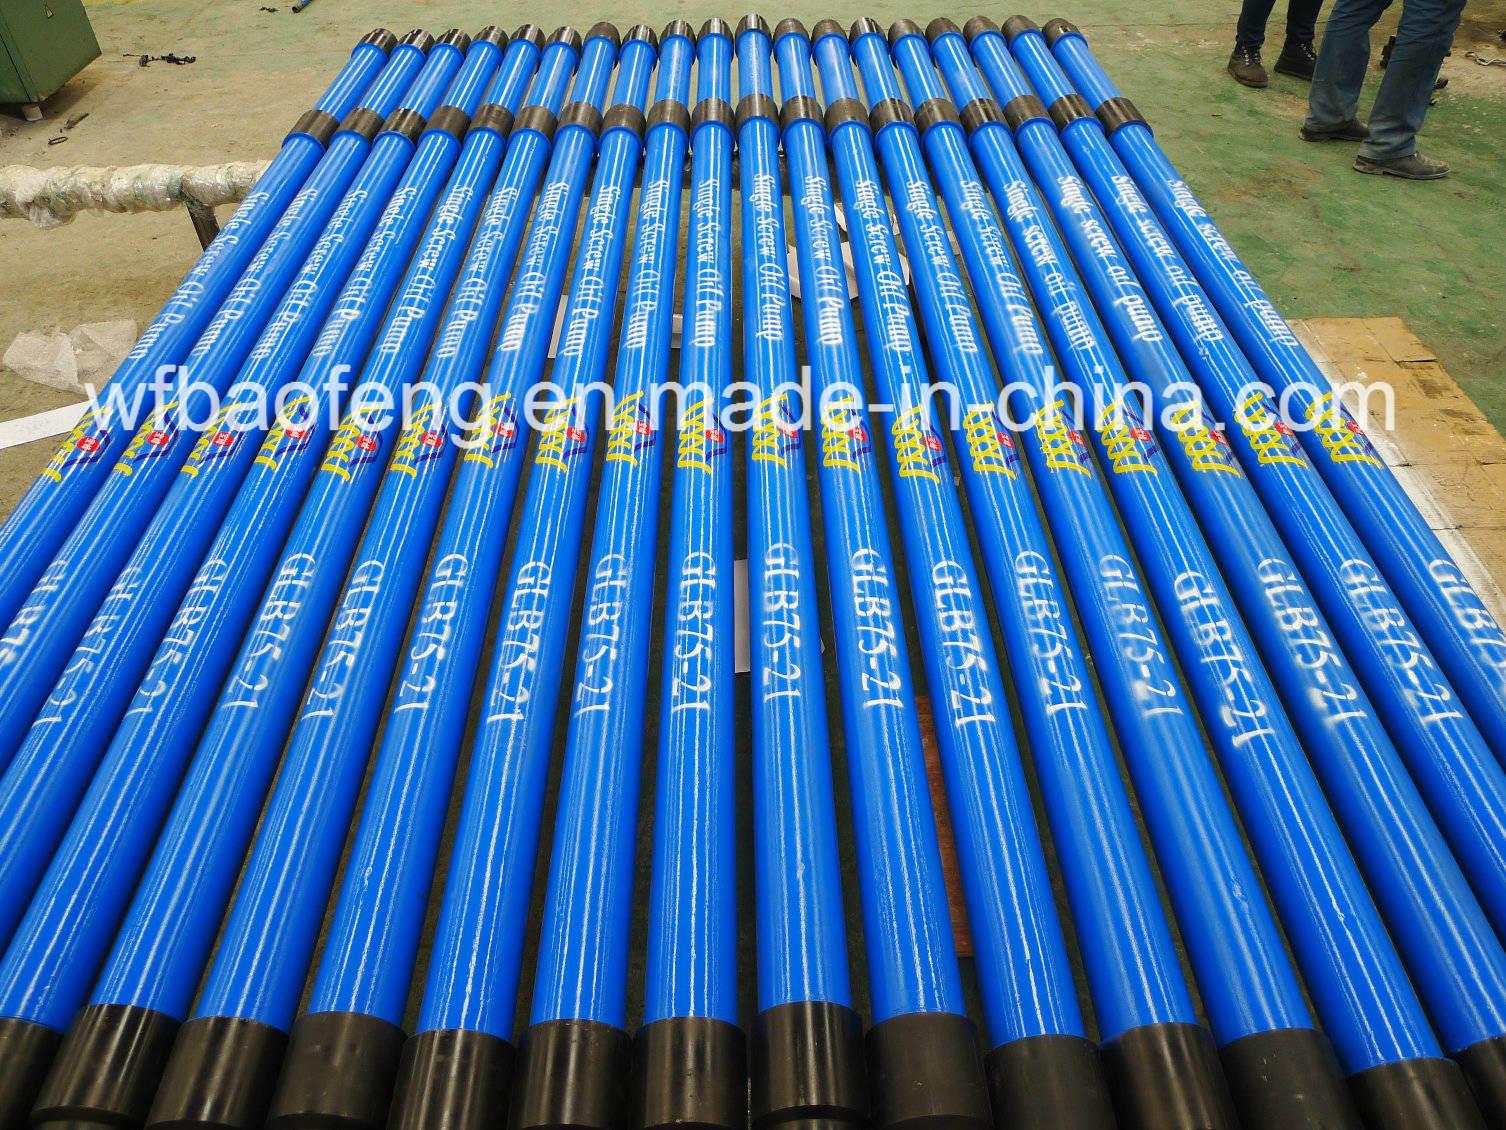 Oilfield Equipment Progressive Cavity Pump (GLB28/40) Screw Pump